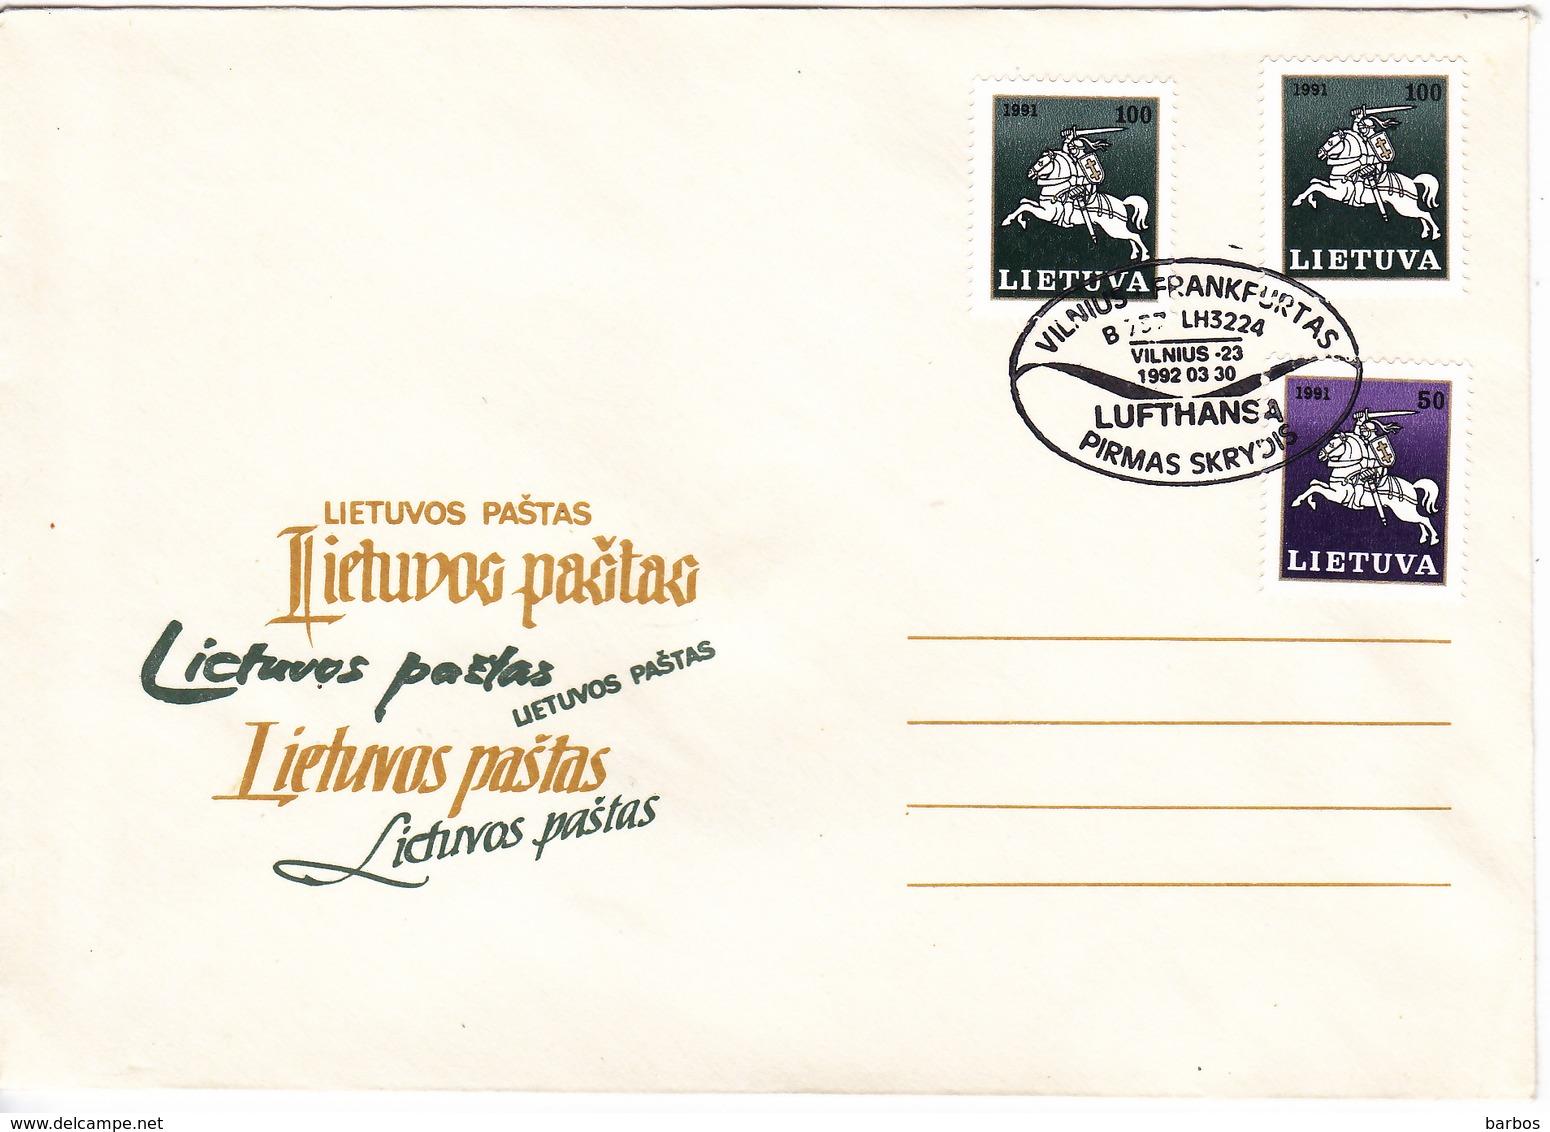 Lituanie   Lietuva 1992 , Vilnius - Frankfurt Lufthansa  , Special Cancell - Lithuania